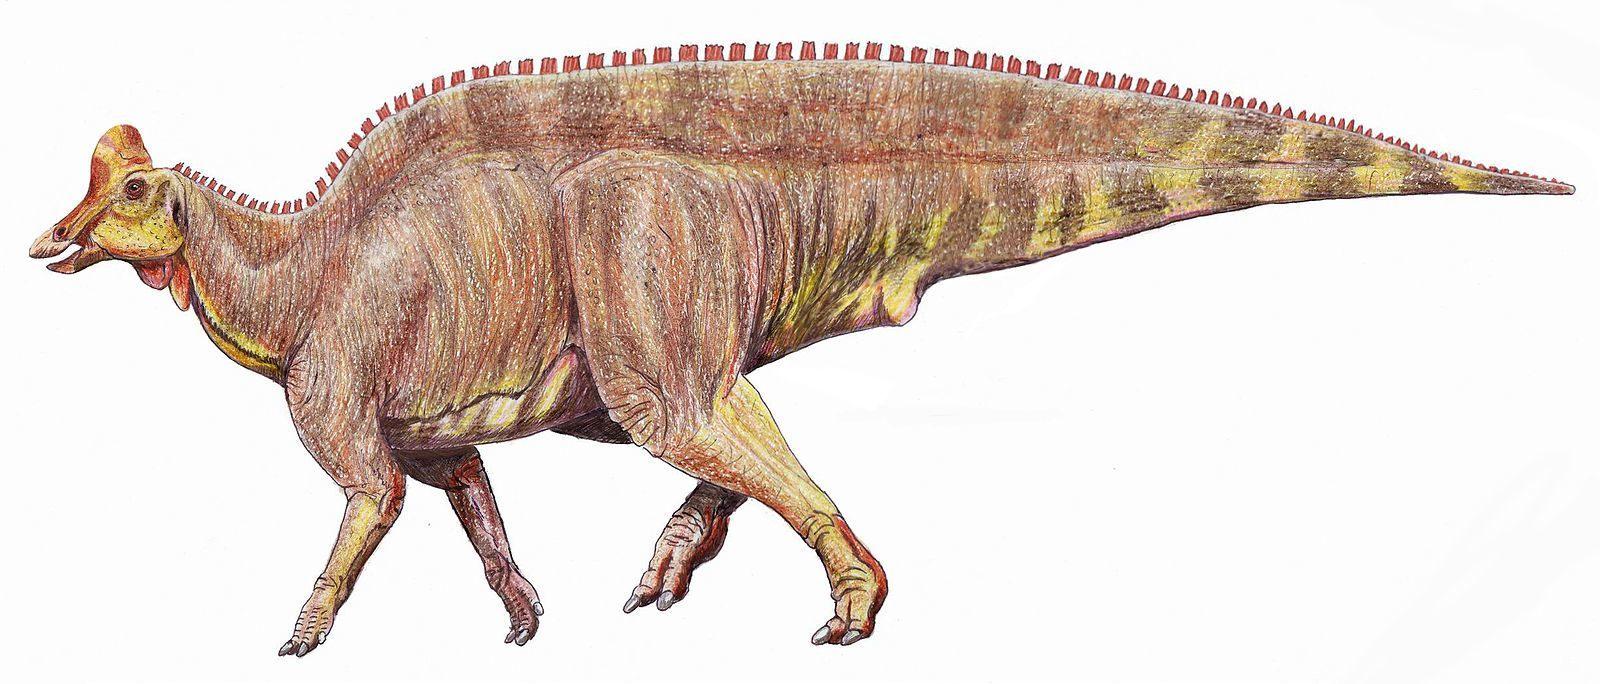 Reconstruction of the Hadrosaur Lambeosaurus. By Dmitry Bogdanov